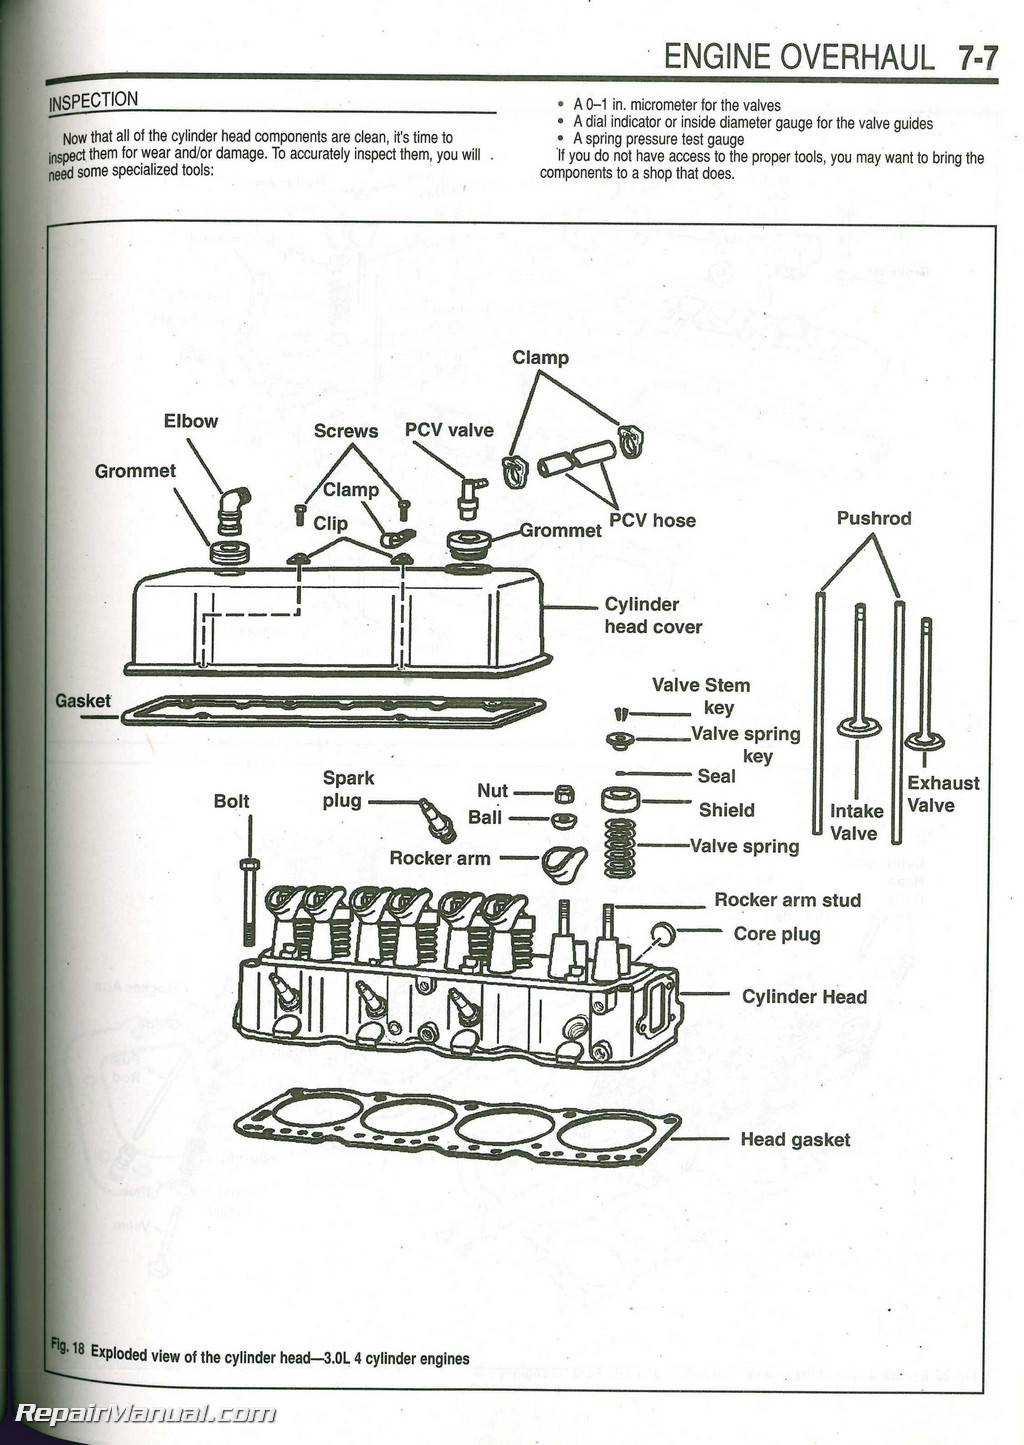 351 Ford Engine Wiring Diagram Omc Cobra Stern Drive Boat Engine Repair Manual 1986 1998